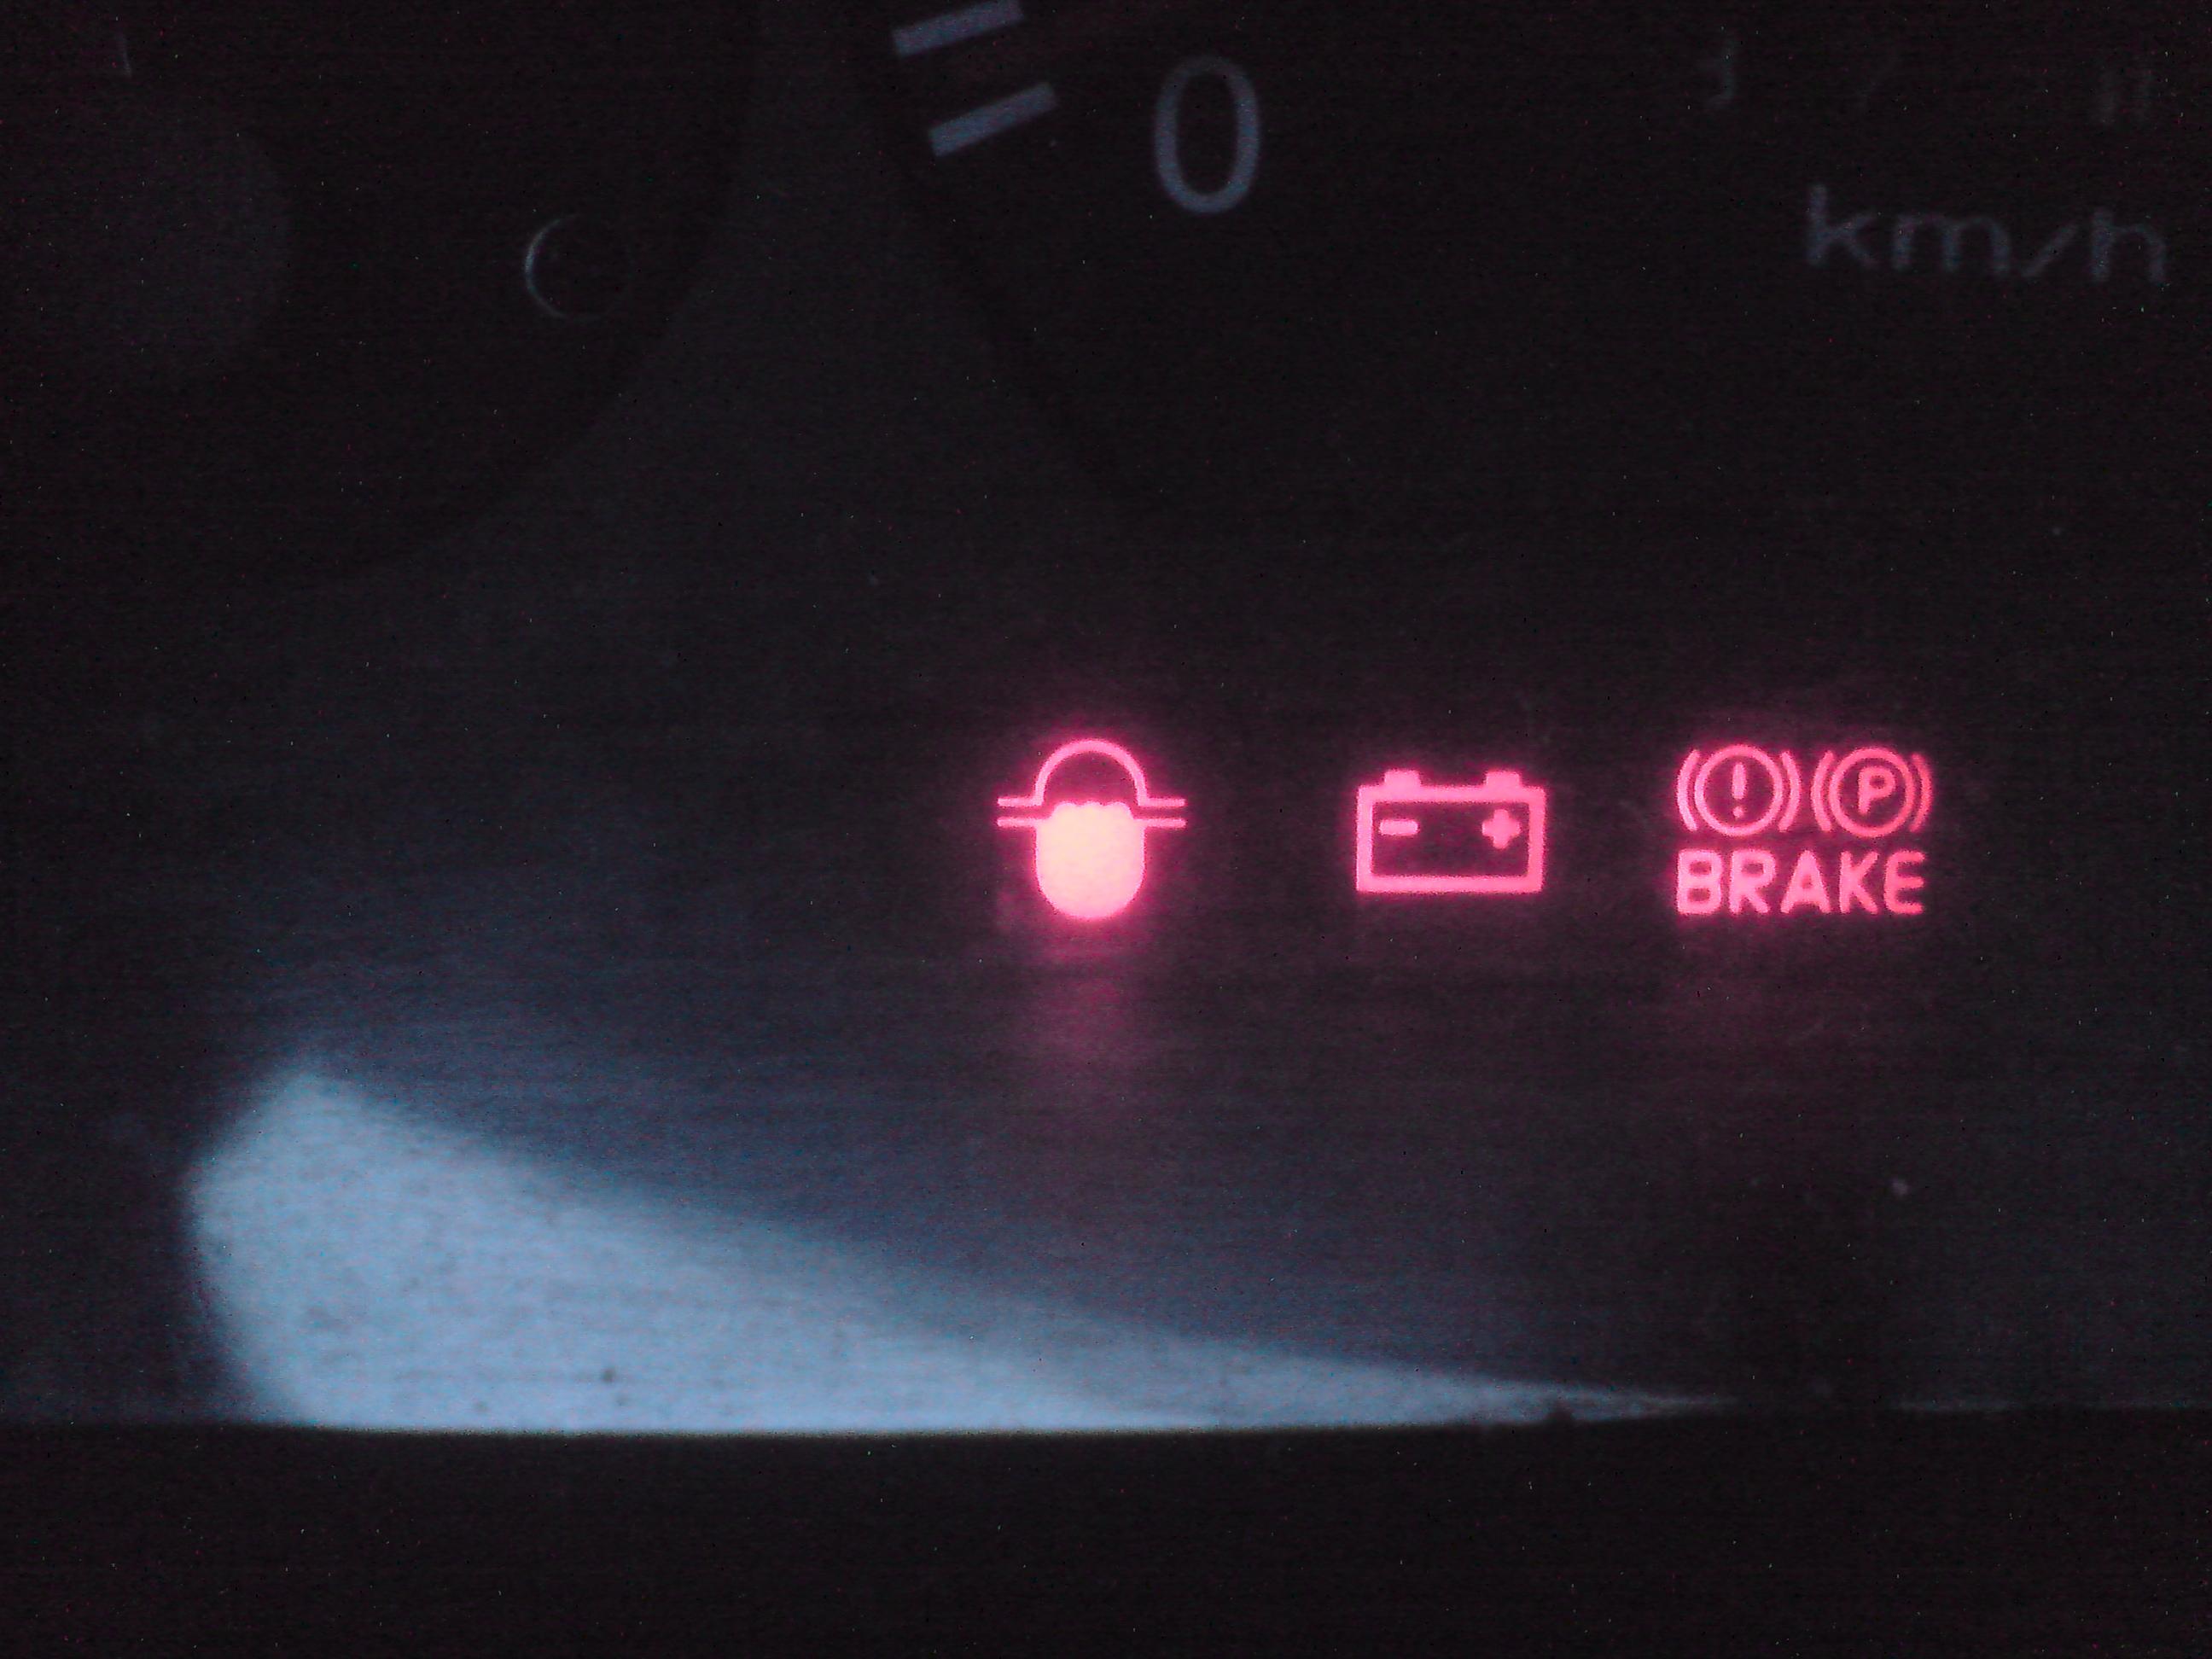 Hyundai h100 - Identyfikacja nieznanej kontrolki.